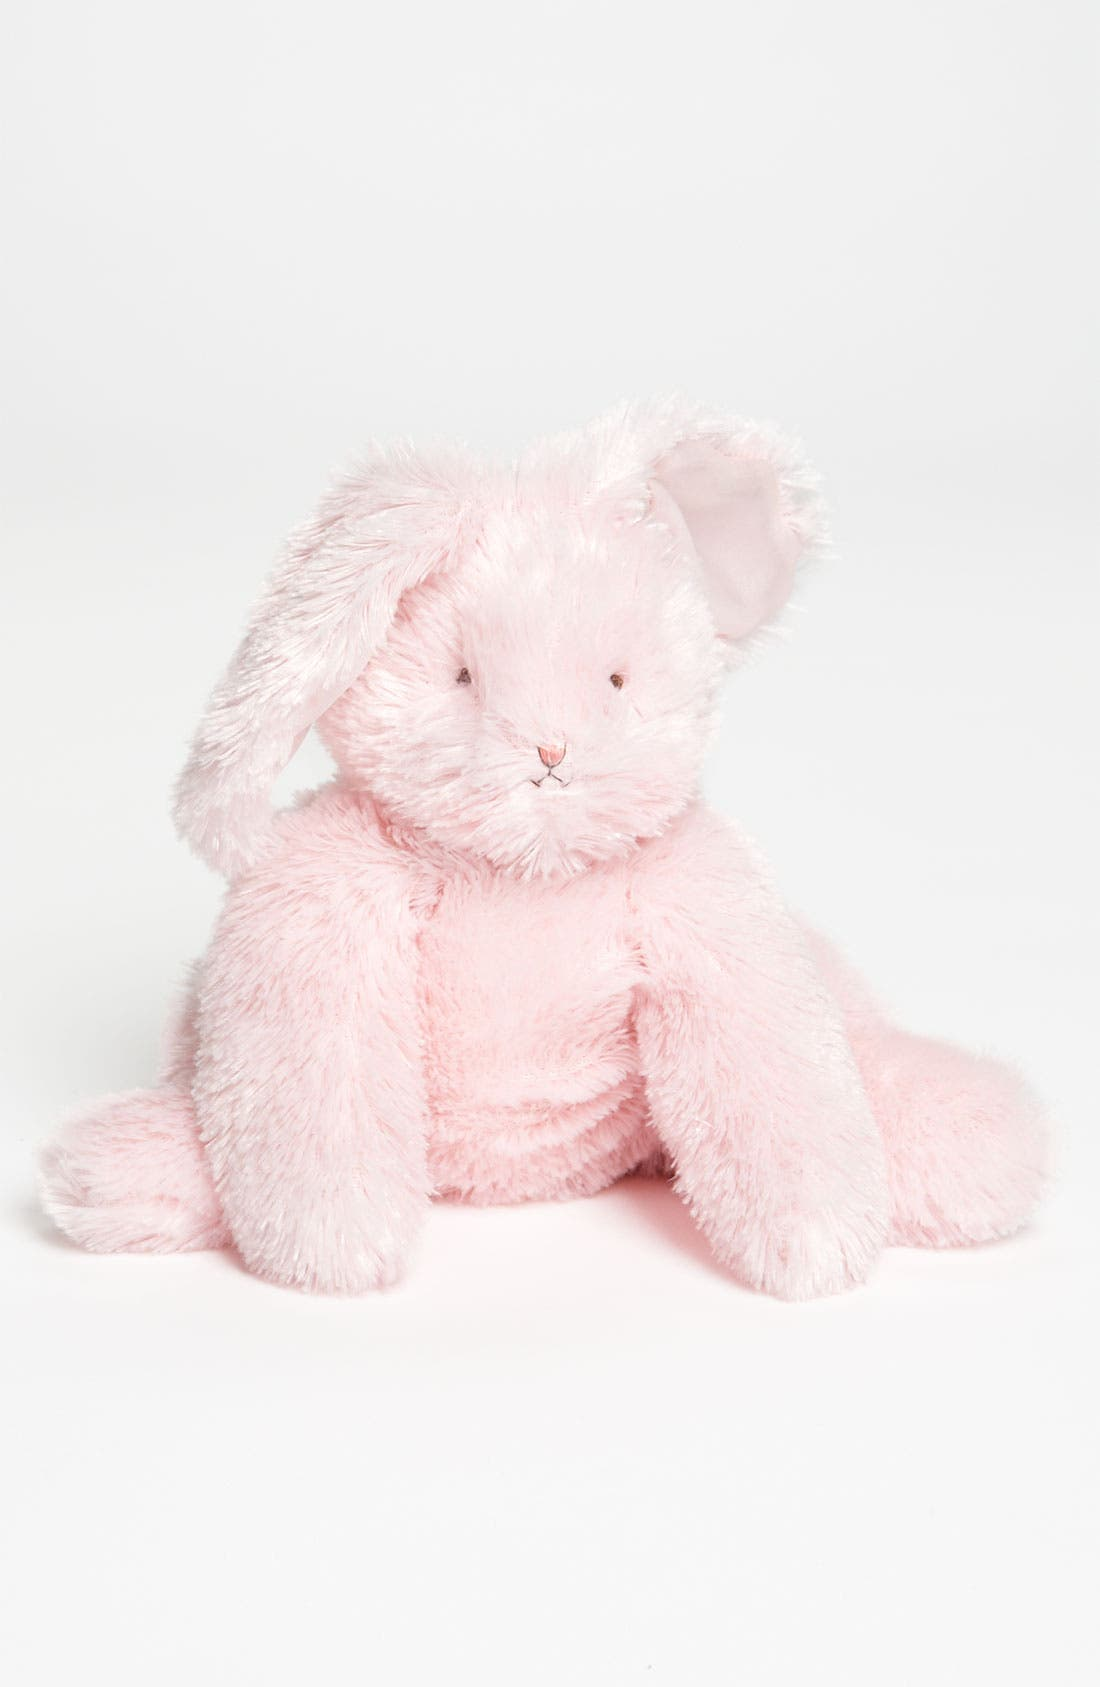 Alternate Image 1 Selected - Bunnies by the Bay Sleepy Bunny